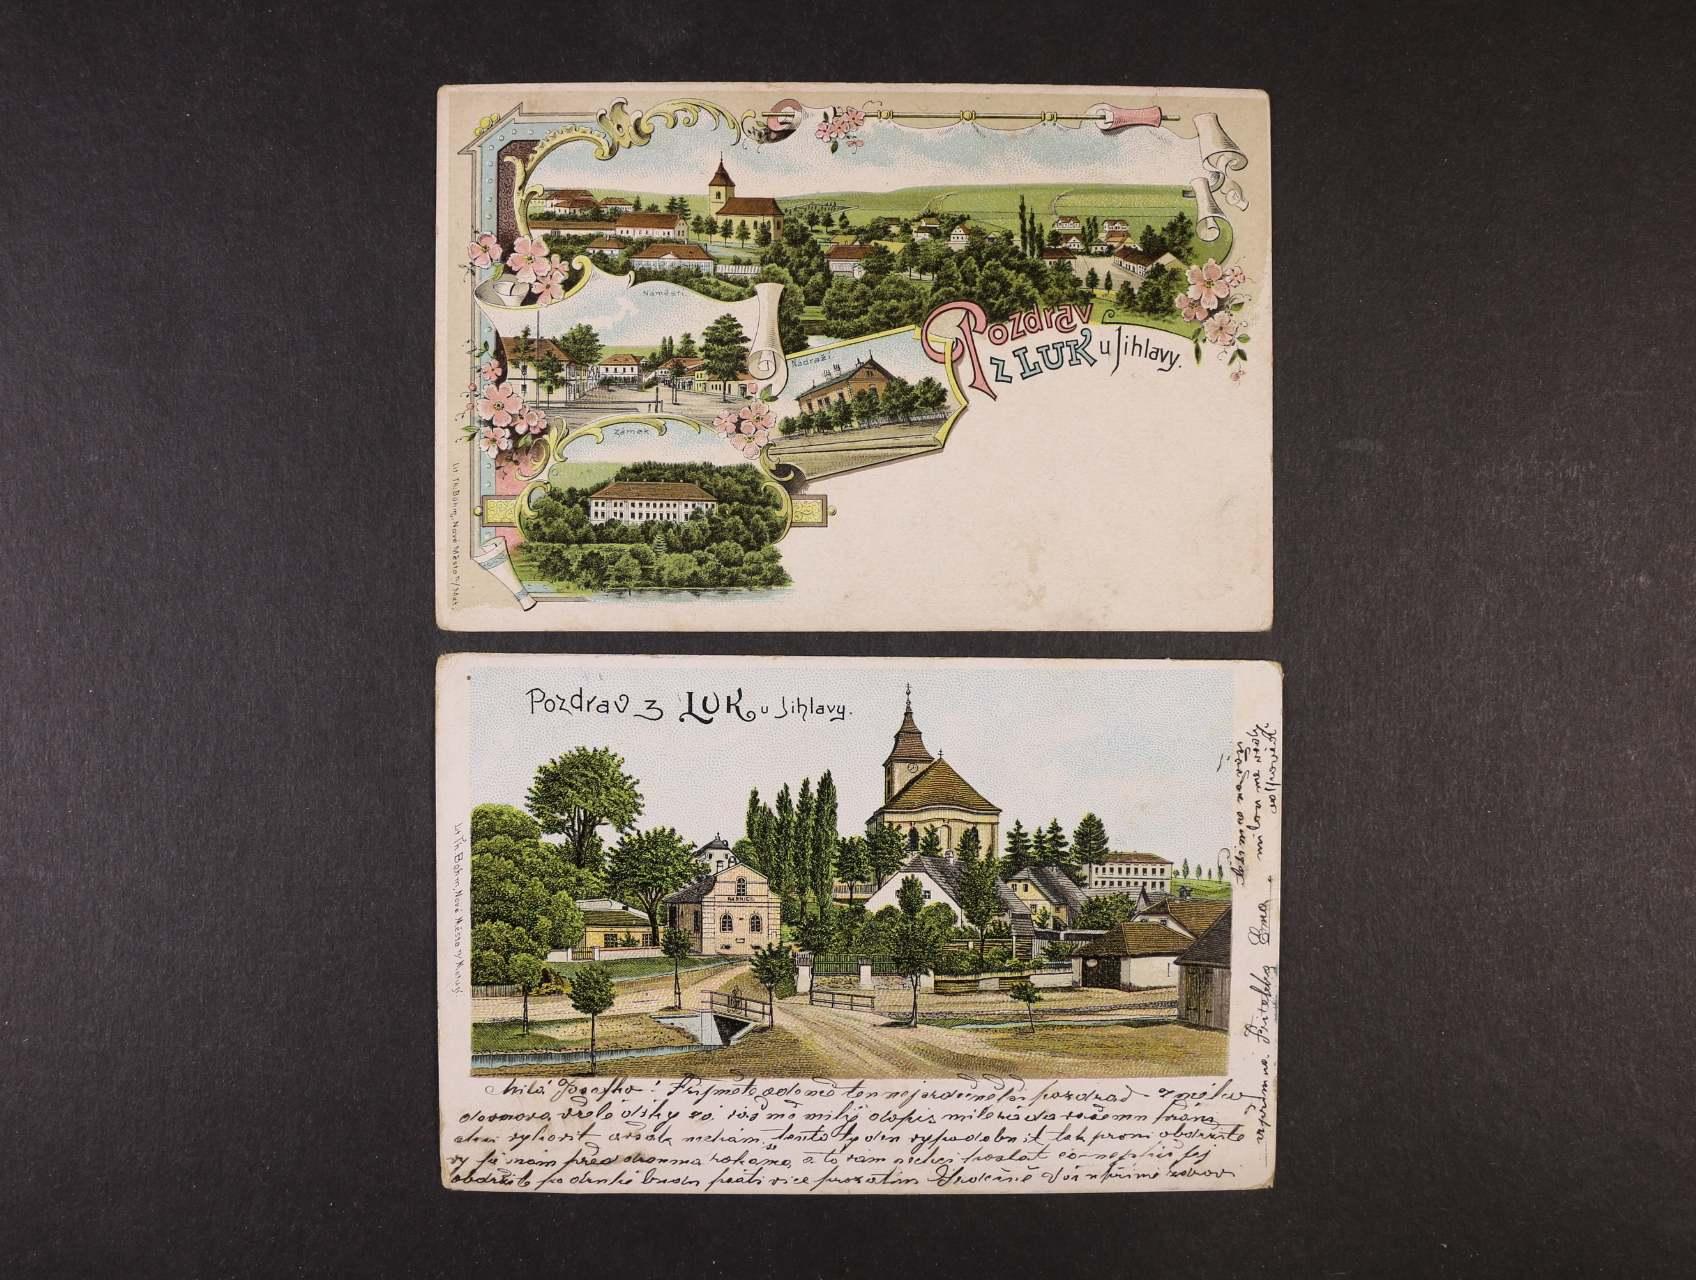 Luka u Jihlavy - bar. litograf. koláž nepoužitá + bar. litograf. koláž použitá 1903, zajímavé